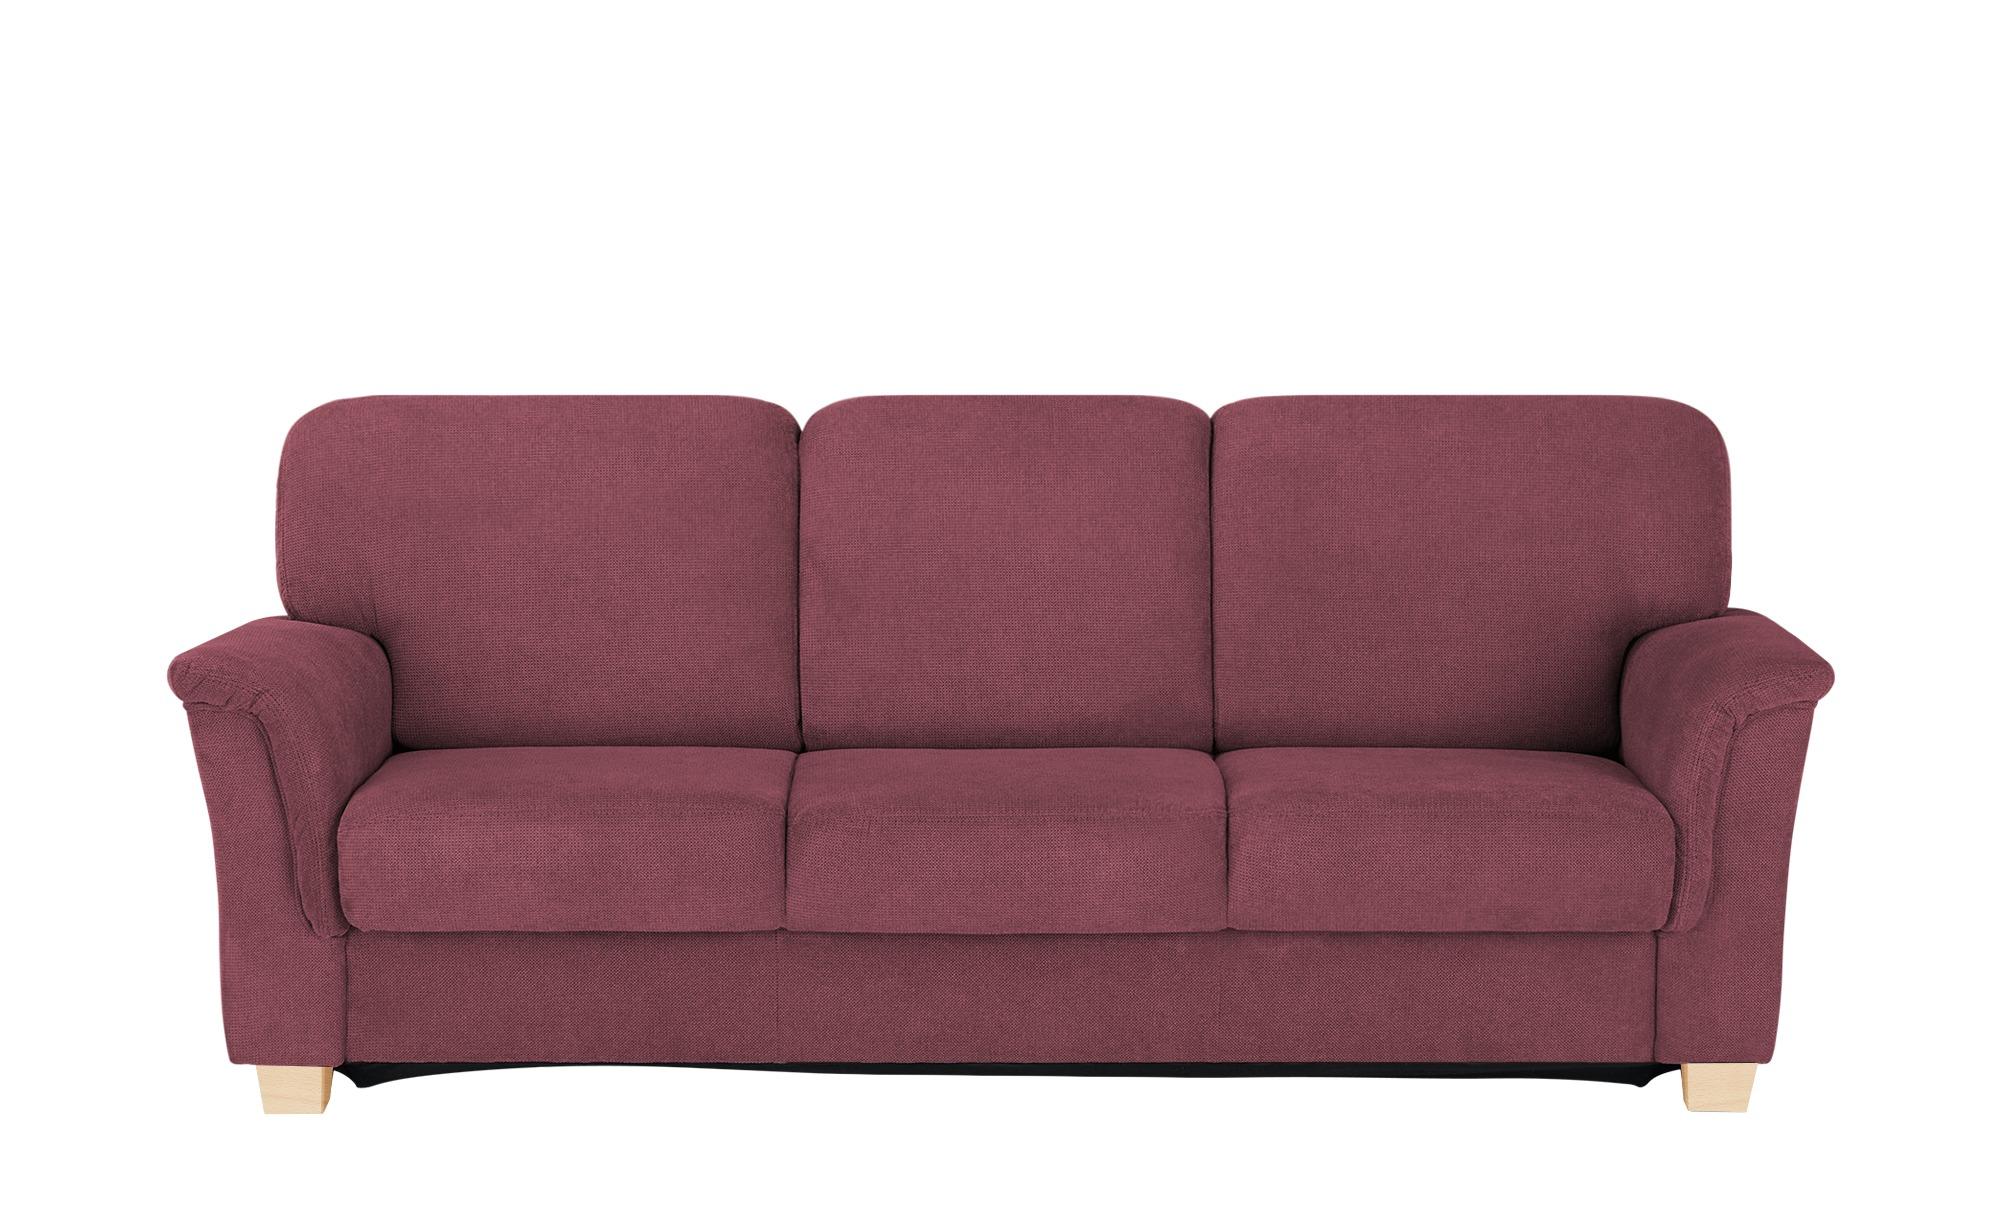 smart Sofa  Valencia ¦ rot ¦ Maße (cm): B: 224 H: 90 T: 93 Polstermöbel > Sofas > 3-Sitzer - Höffner